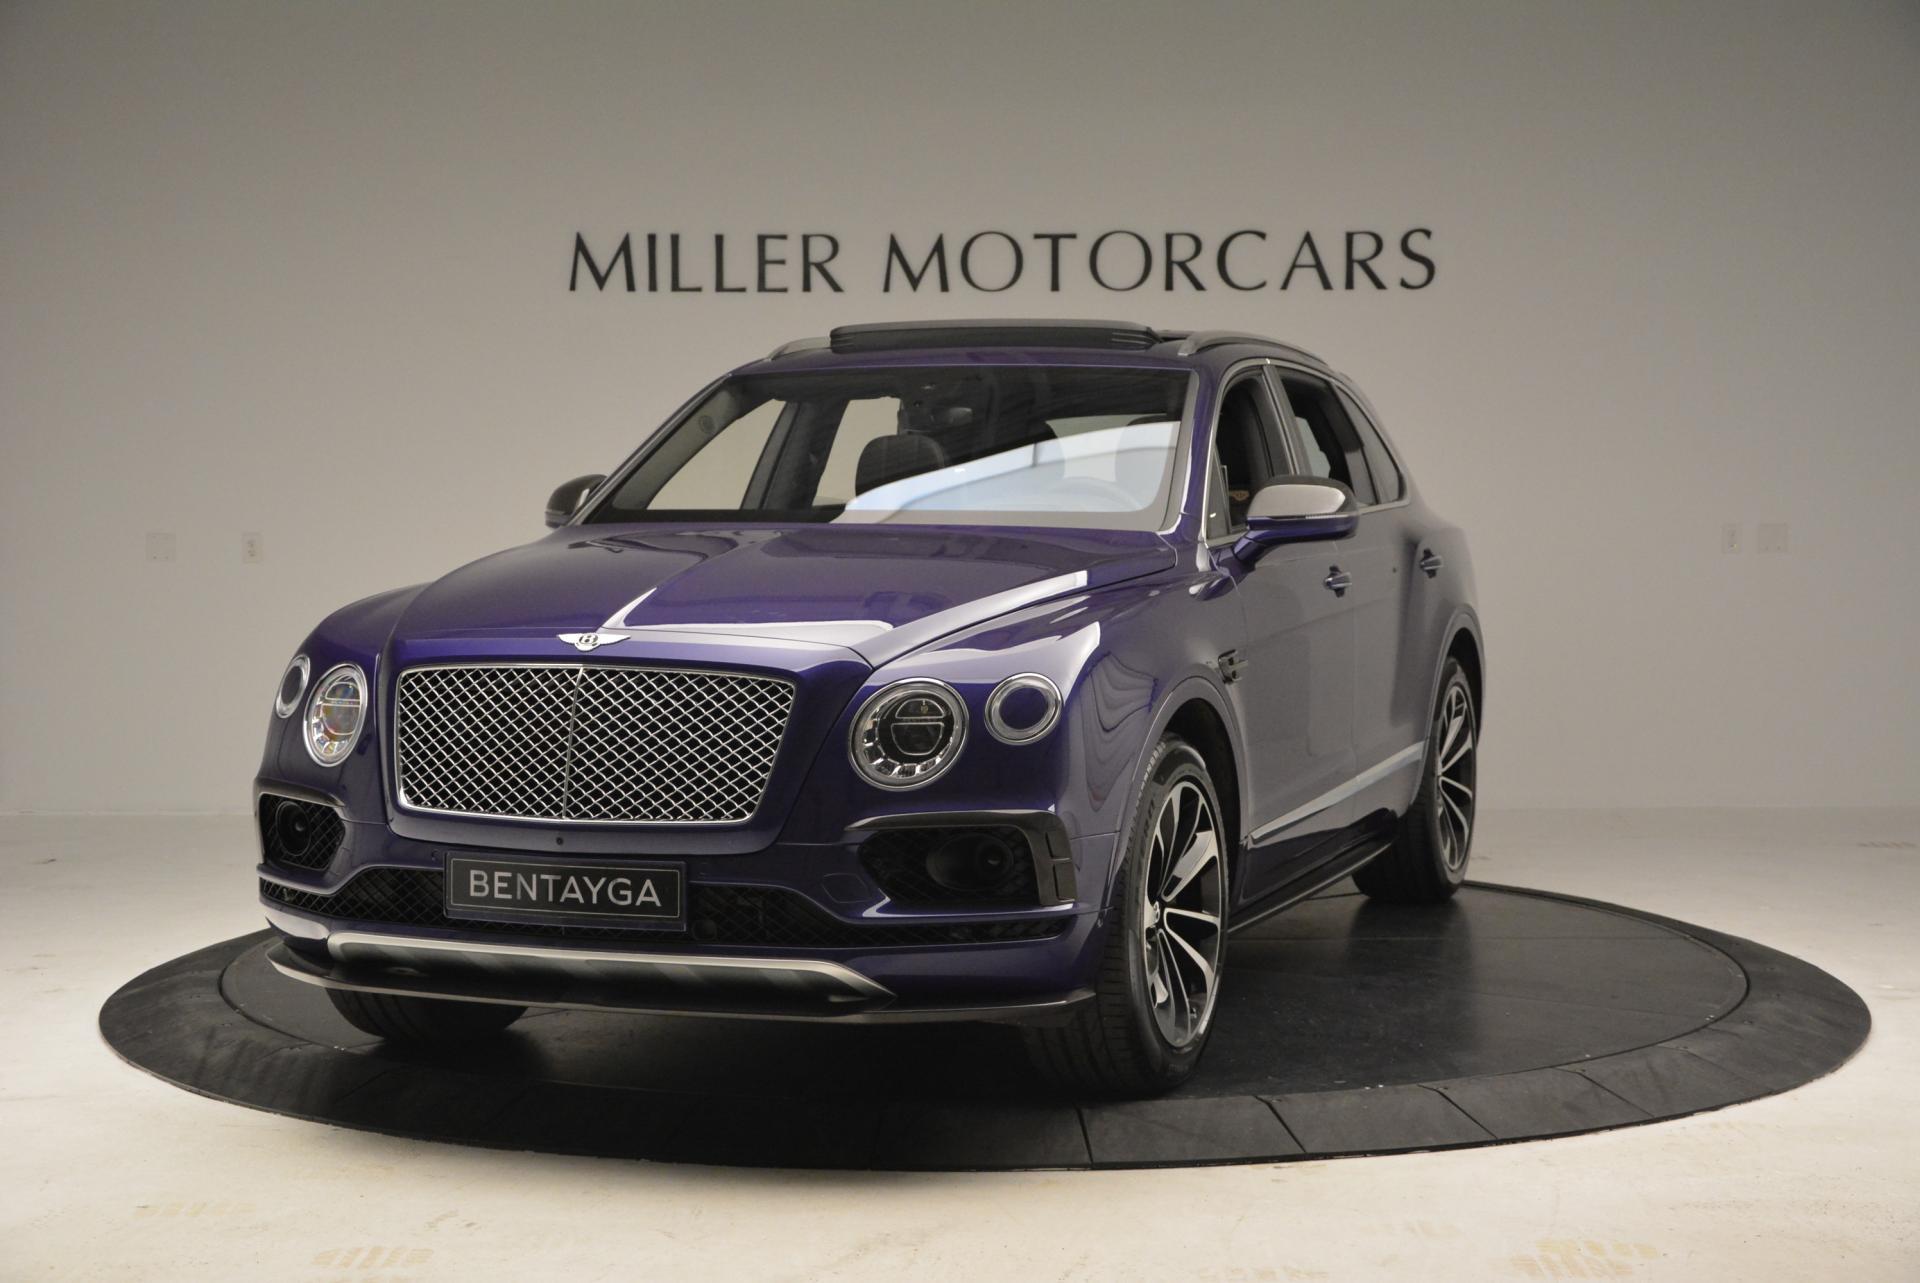 New 2017 Bentley Bentayga for sale Sold at McLaren Greenwich in Greenwich CT 06830 1